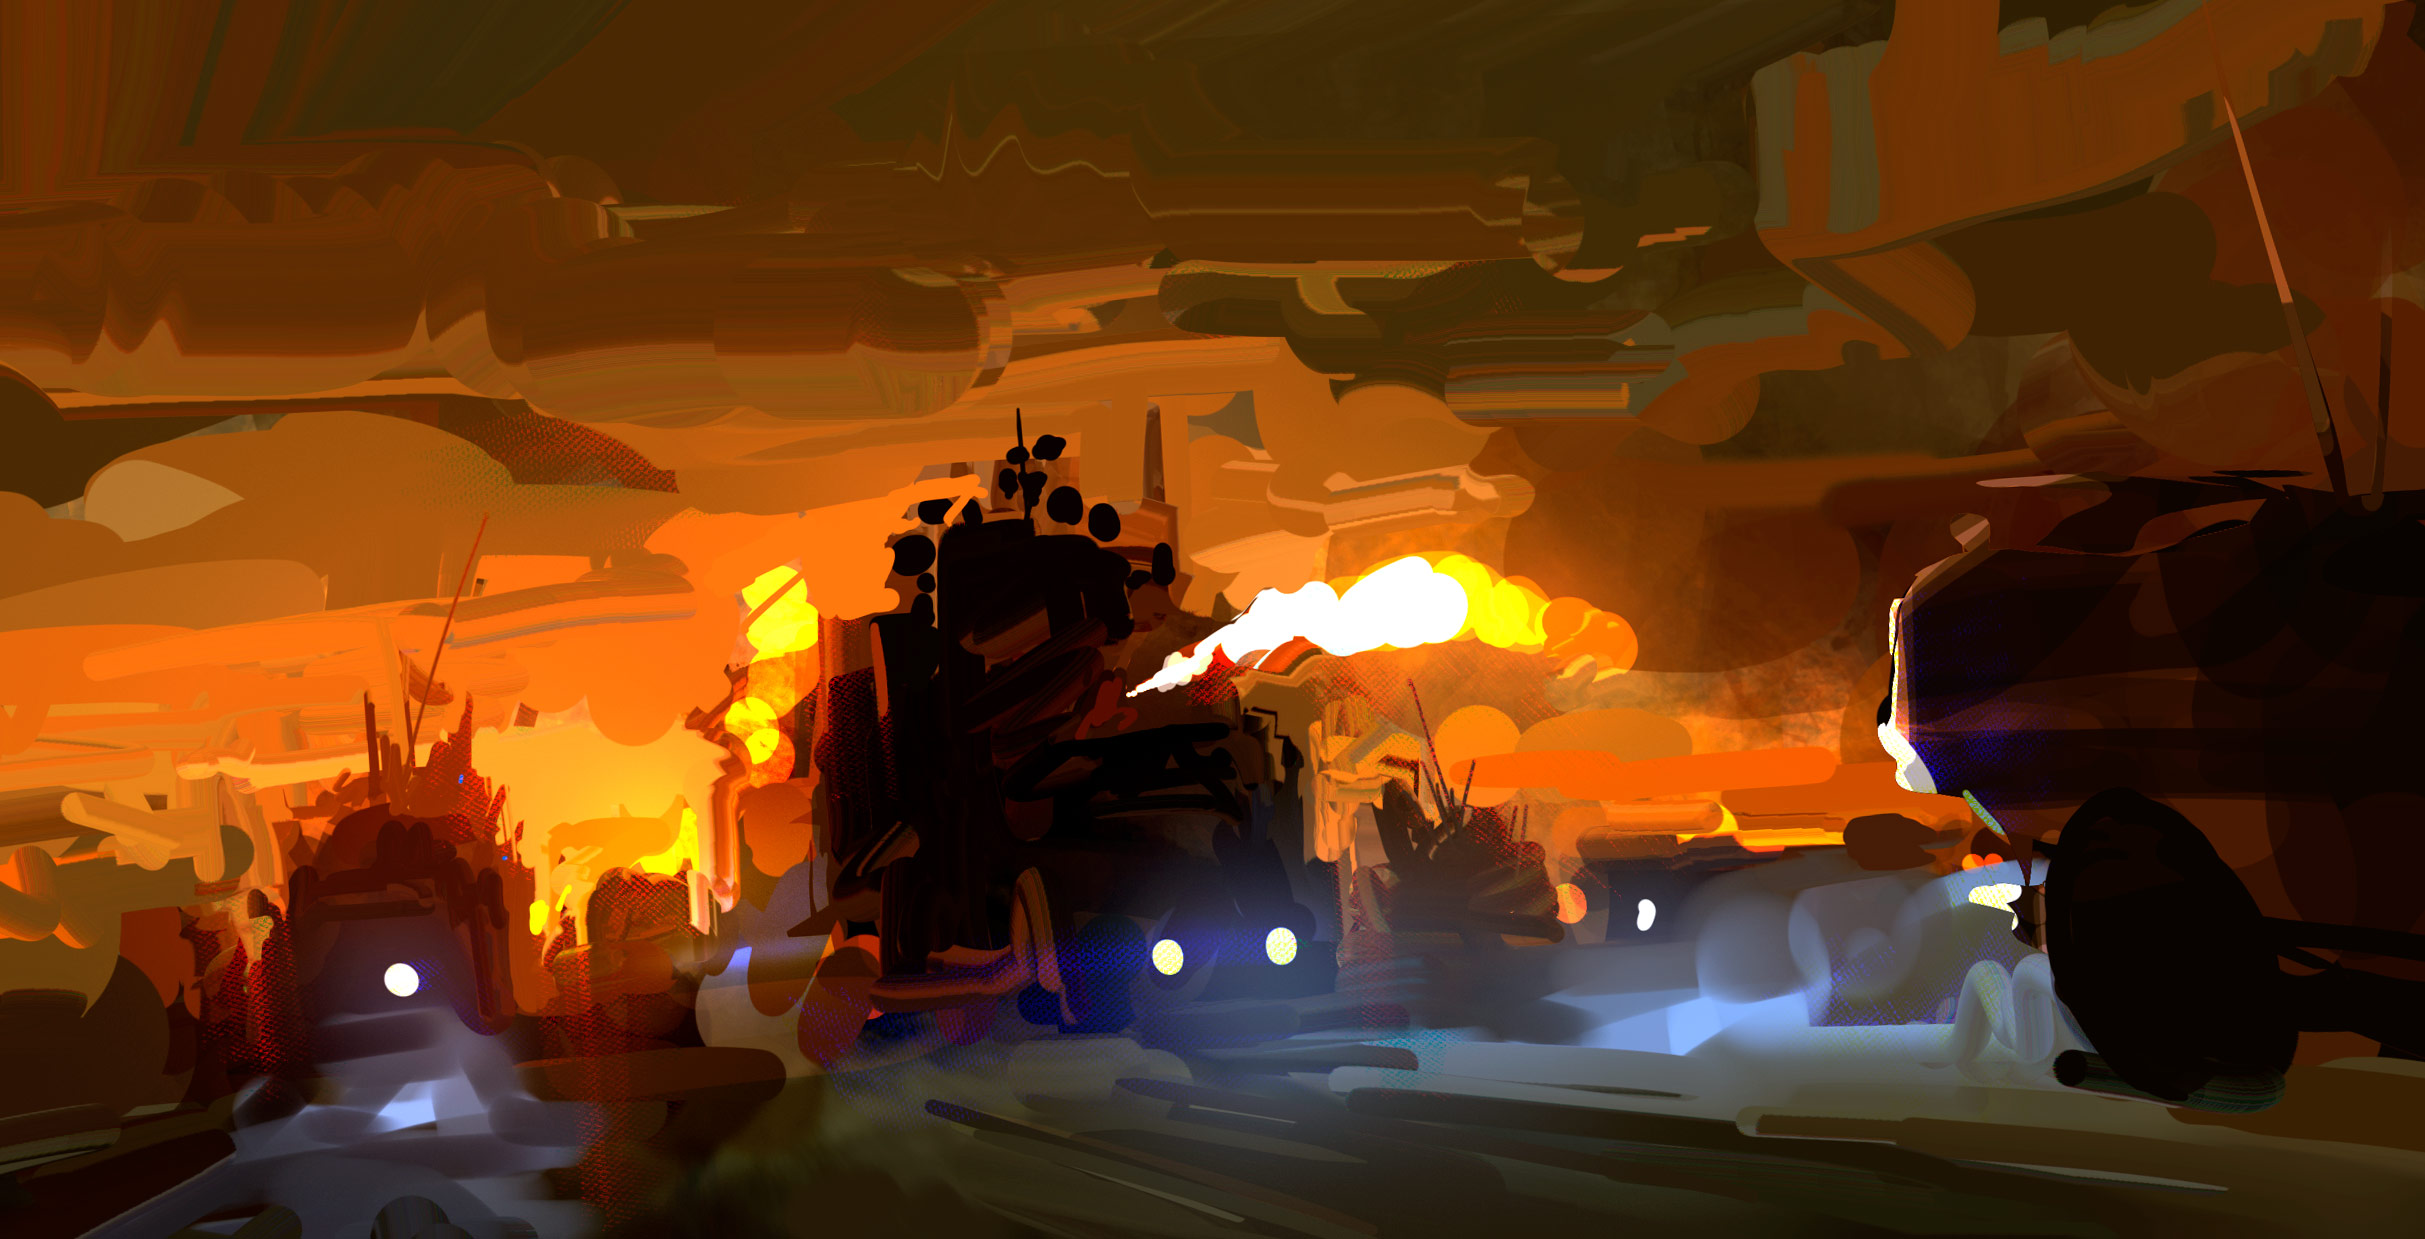 Mad Max Sketch By Yakonusuke On Deviantart